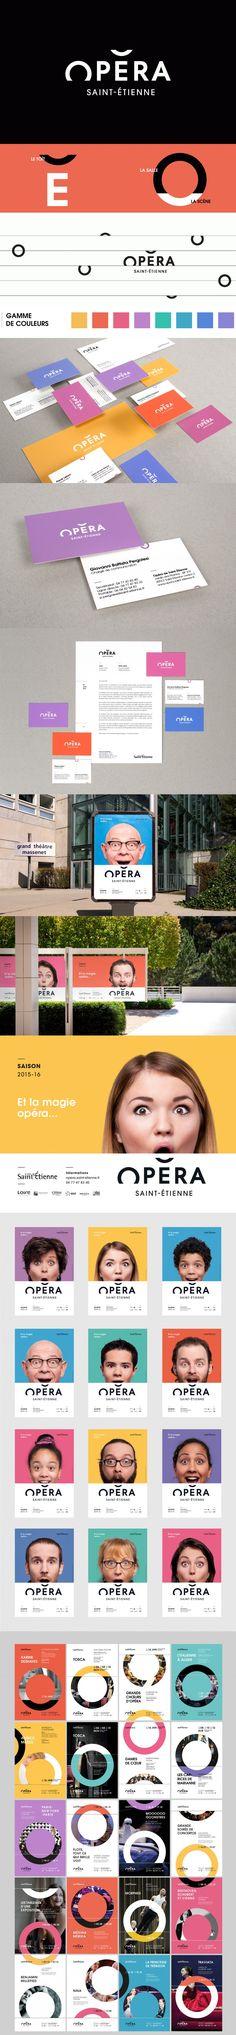 Opera Saint-Etienne branding